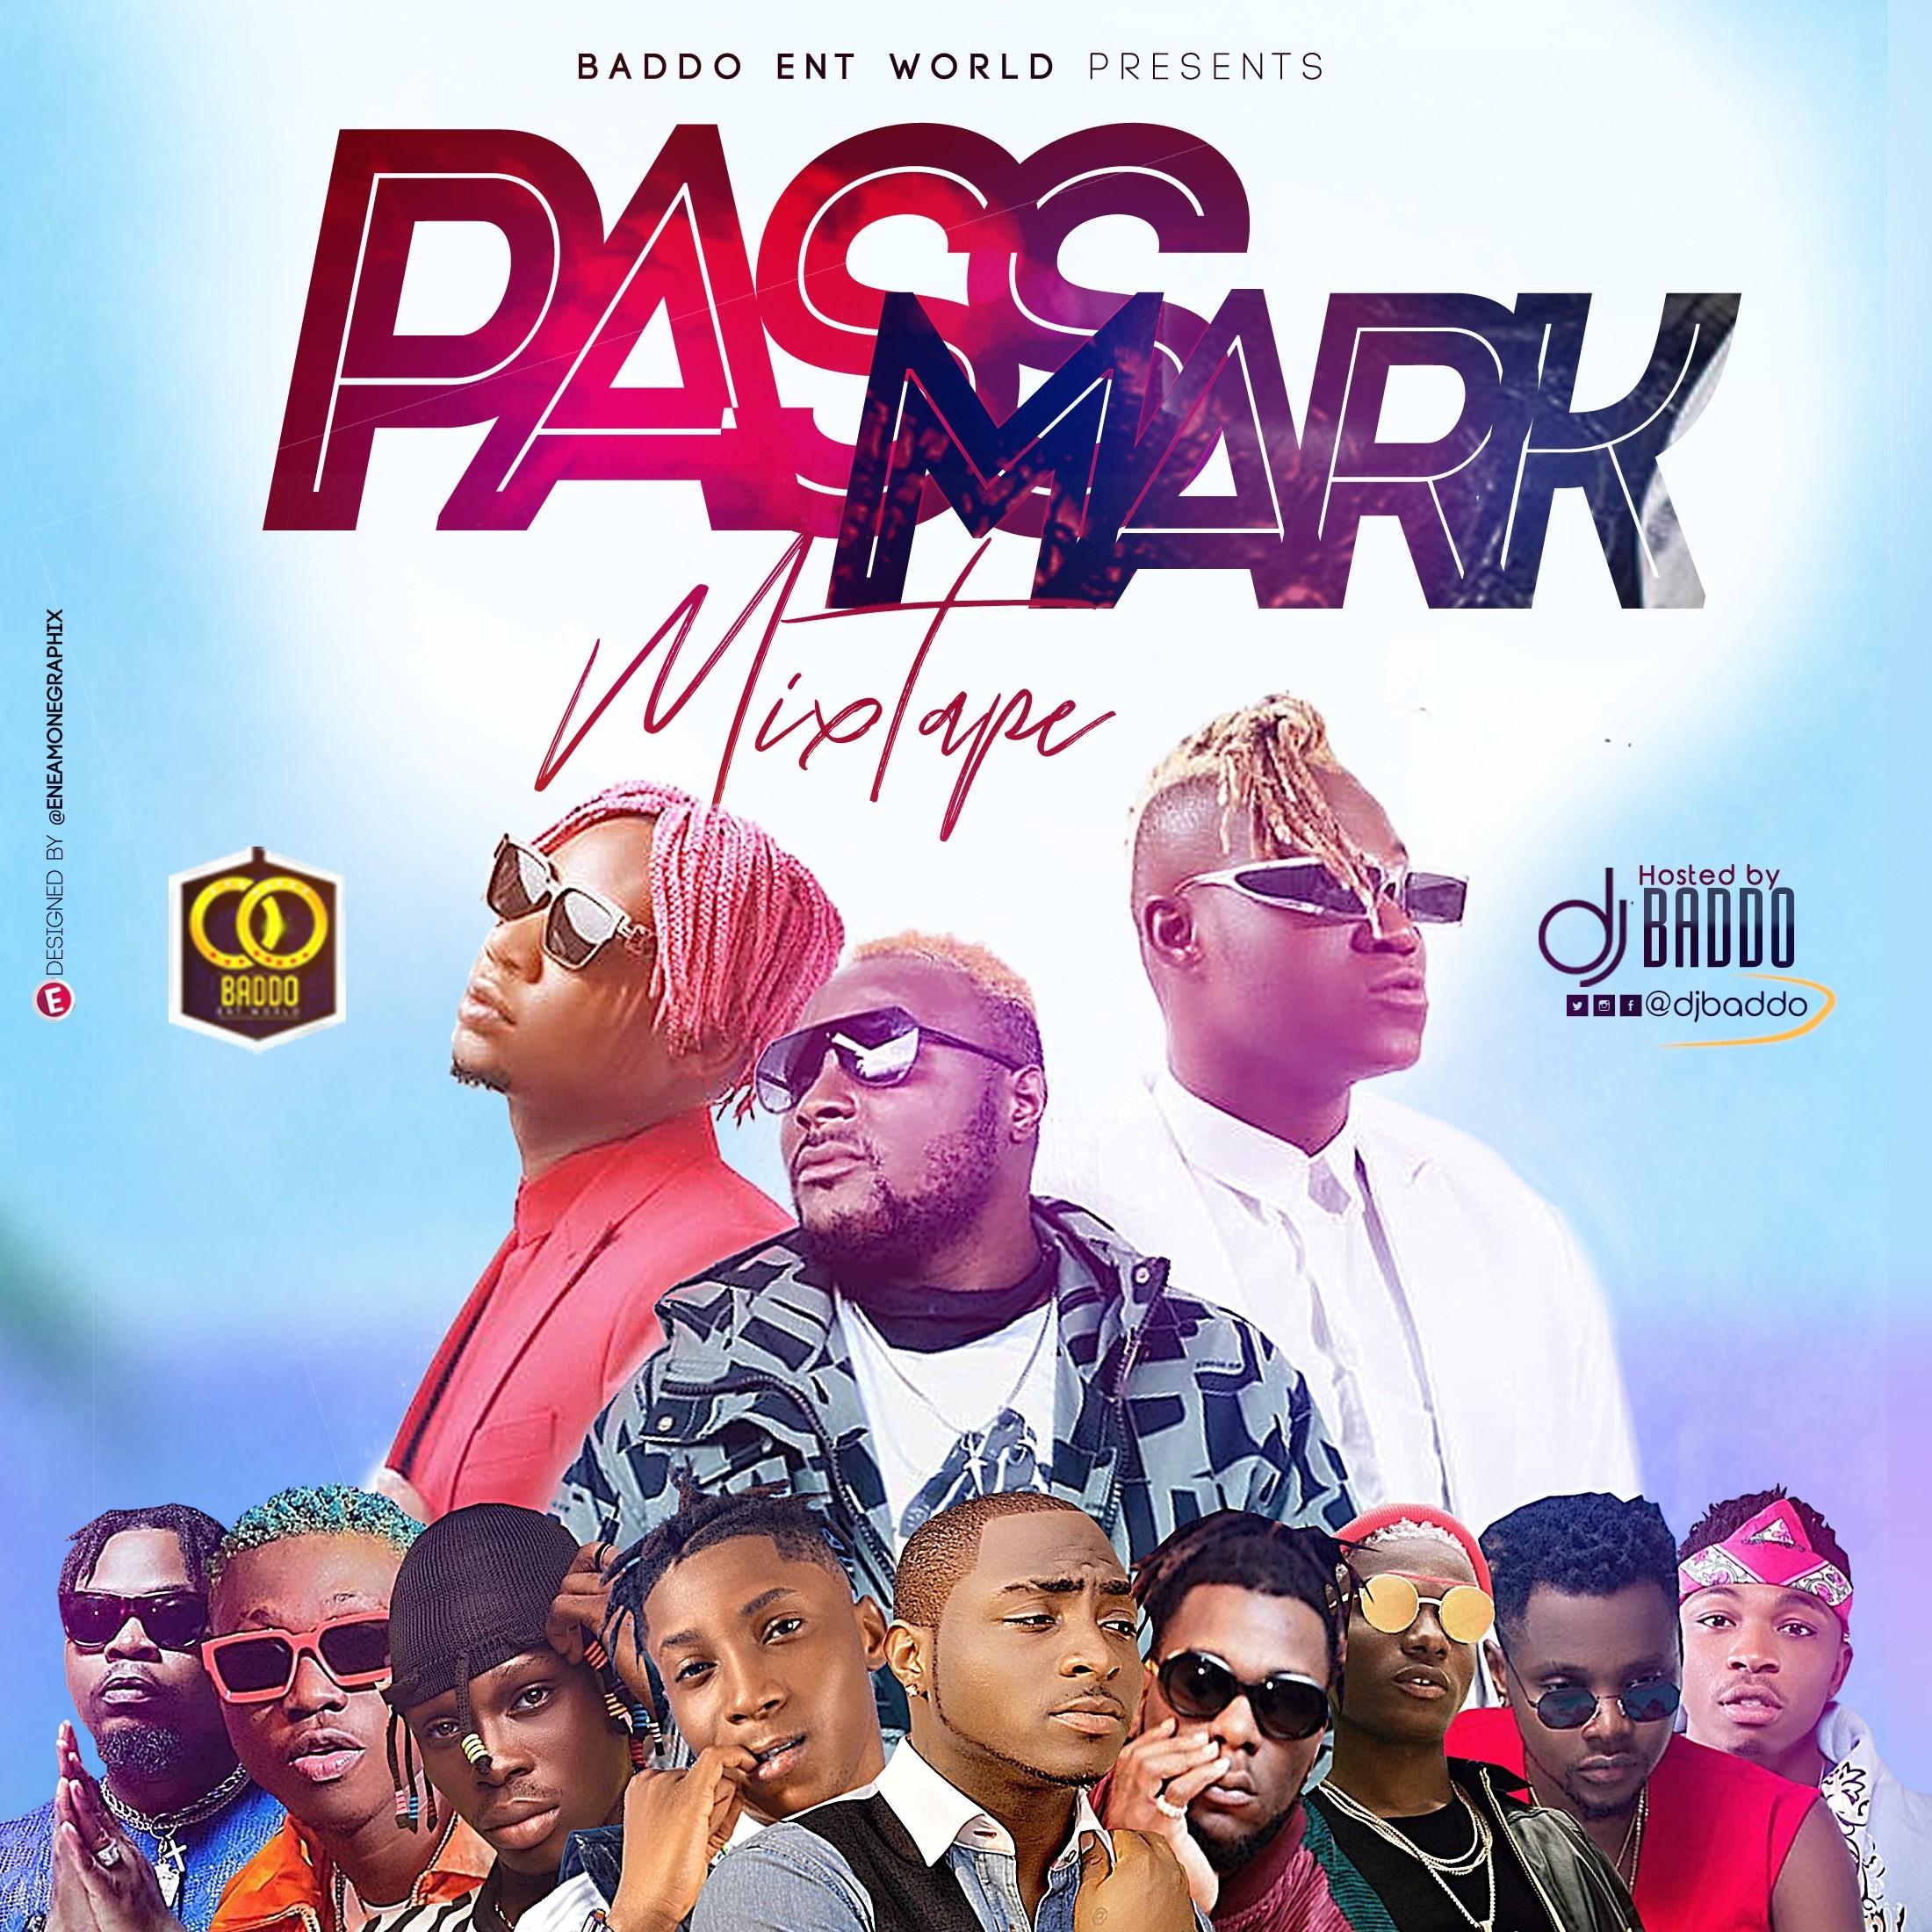 Dj Baddo Pass Mark Mixtape